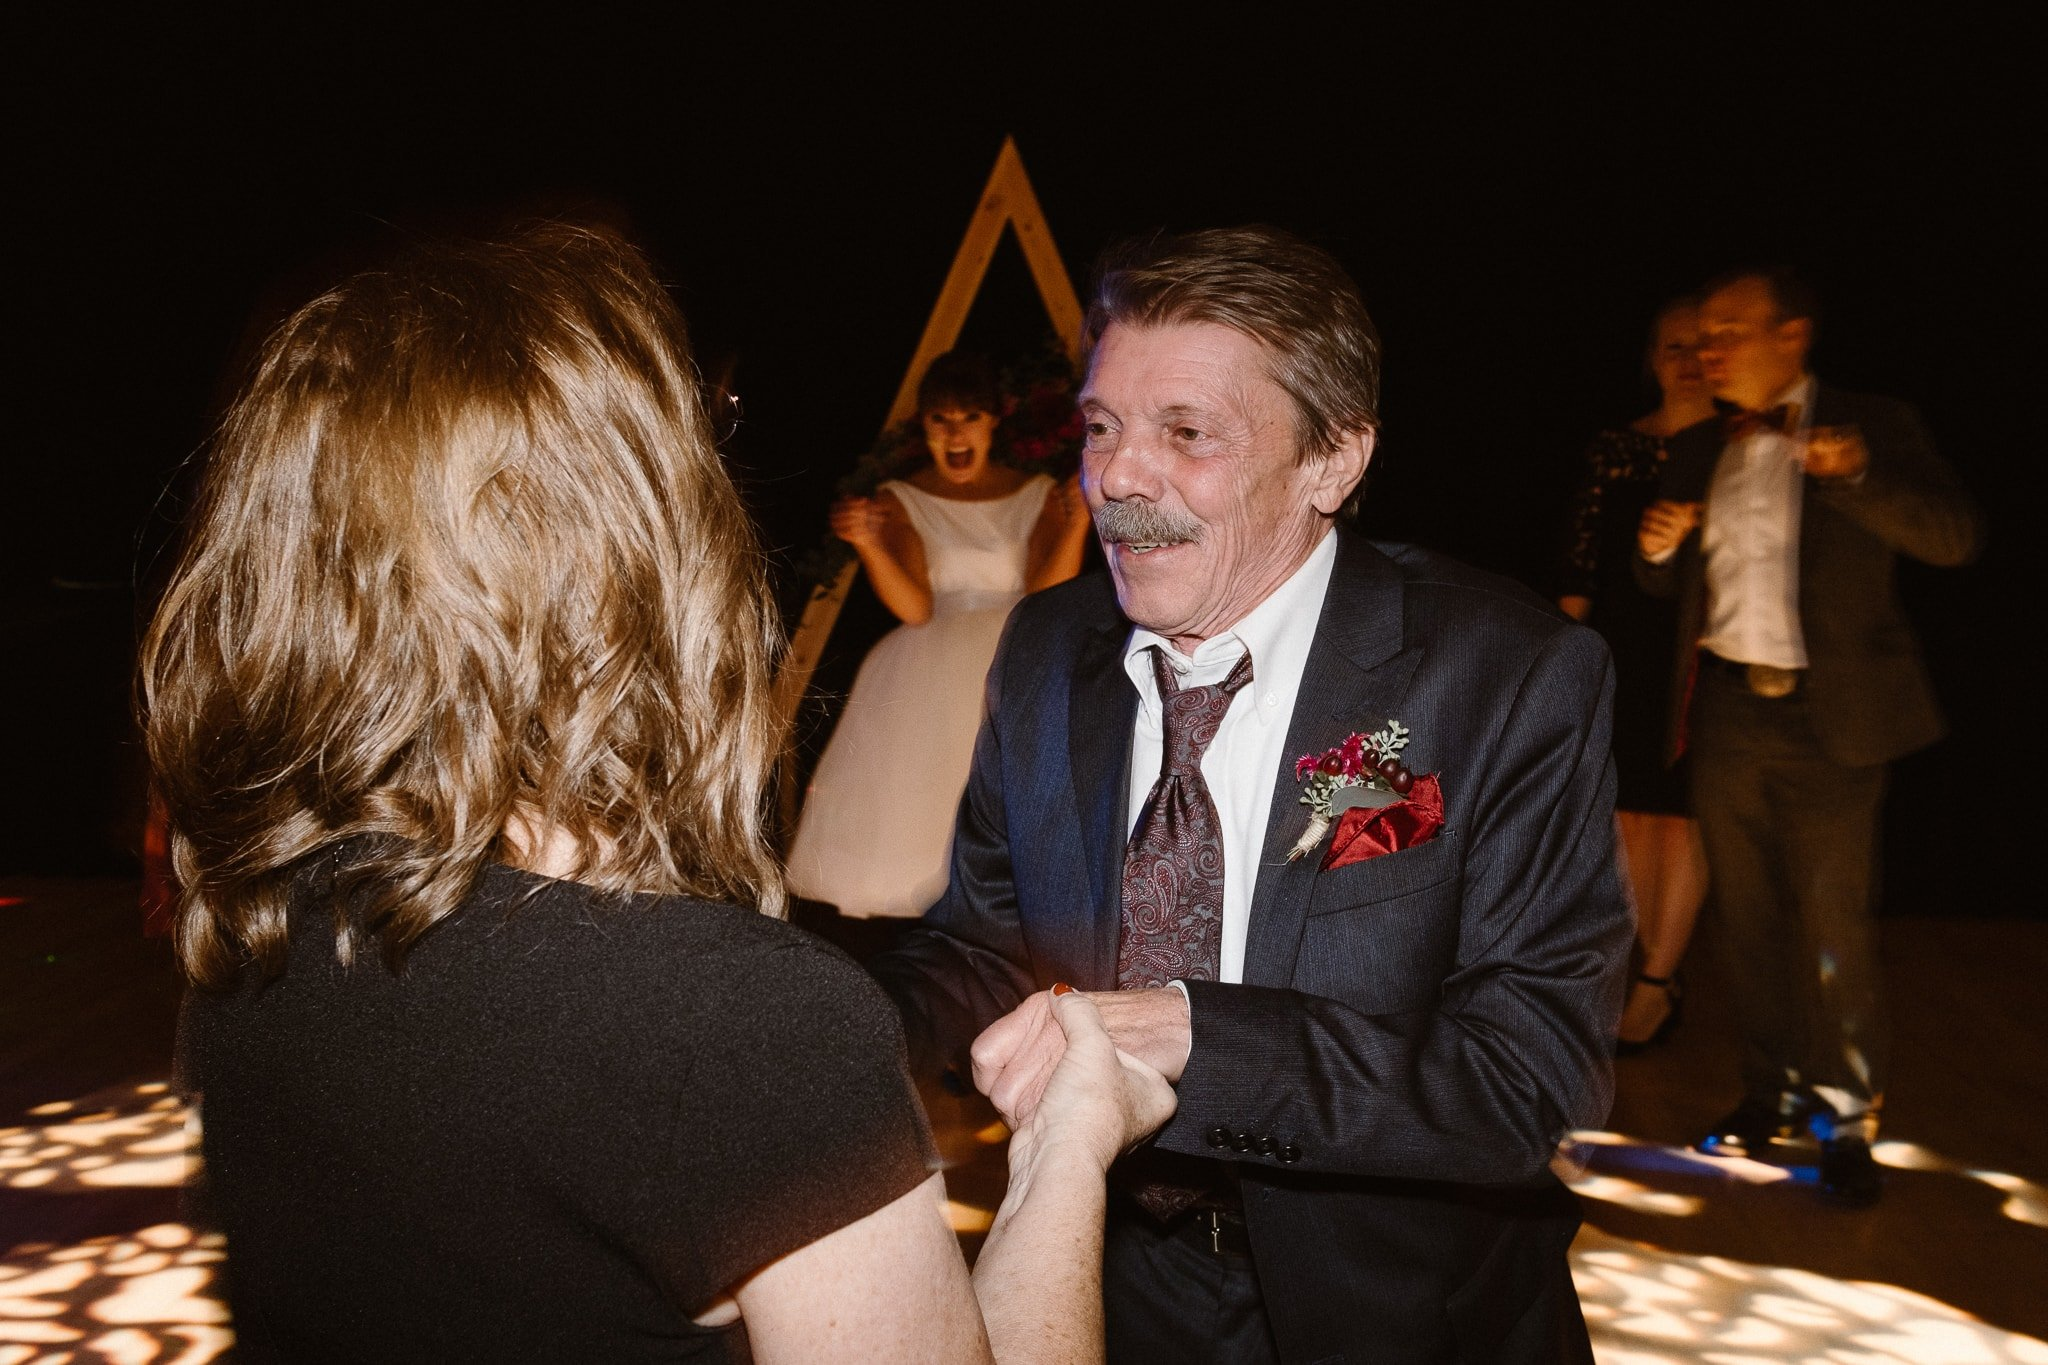 Silverthorne Pavilion wedding photography, Colorado wedding photographer, wedding reception dance party